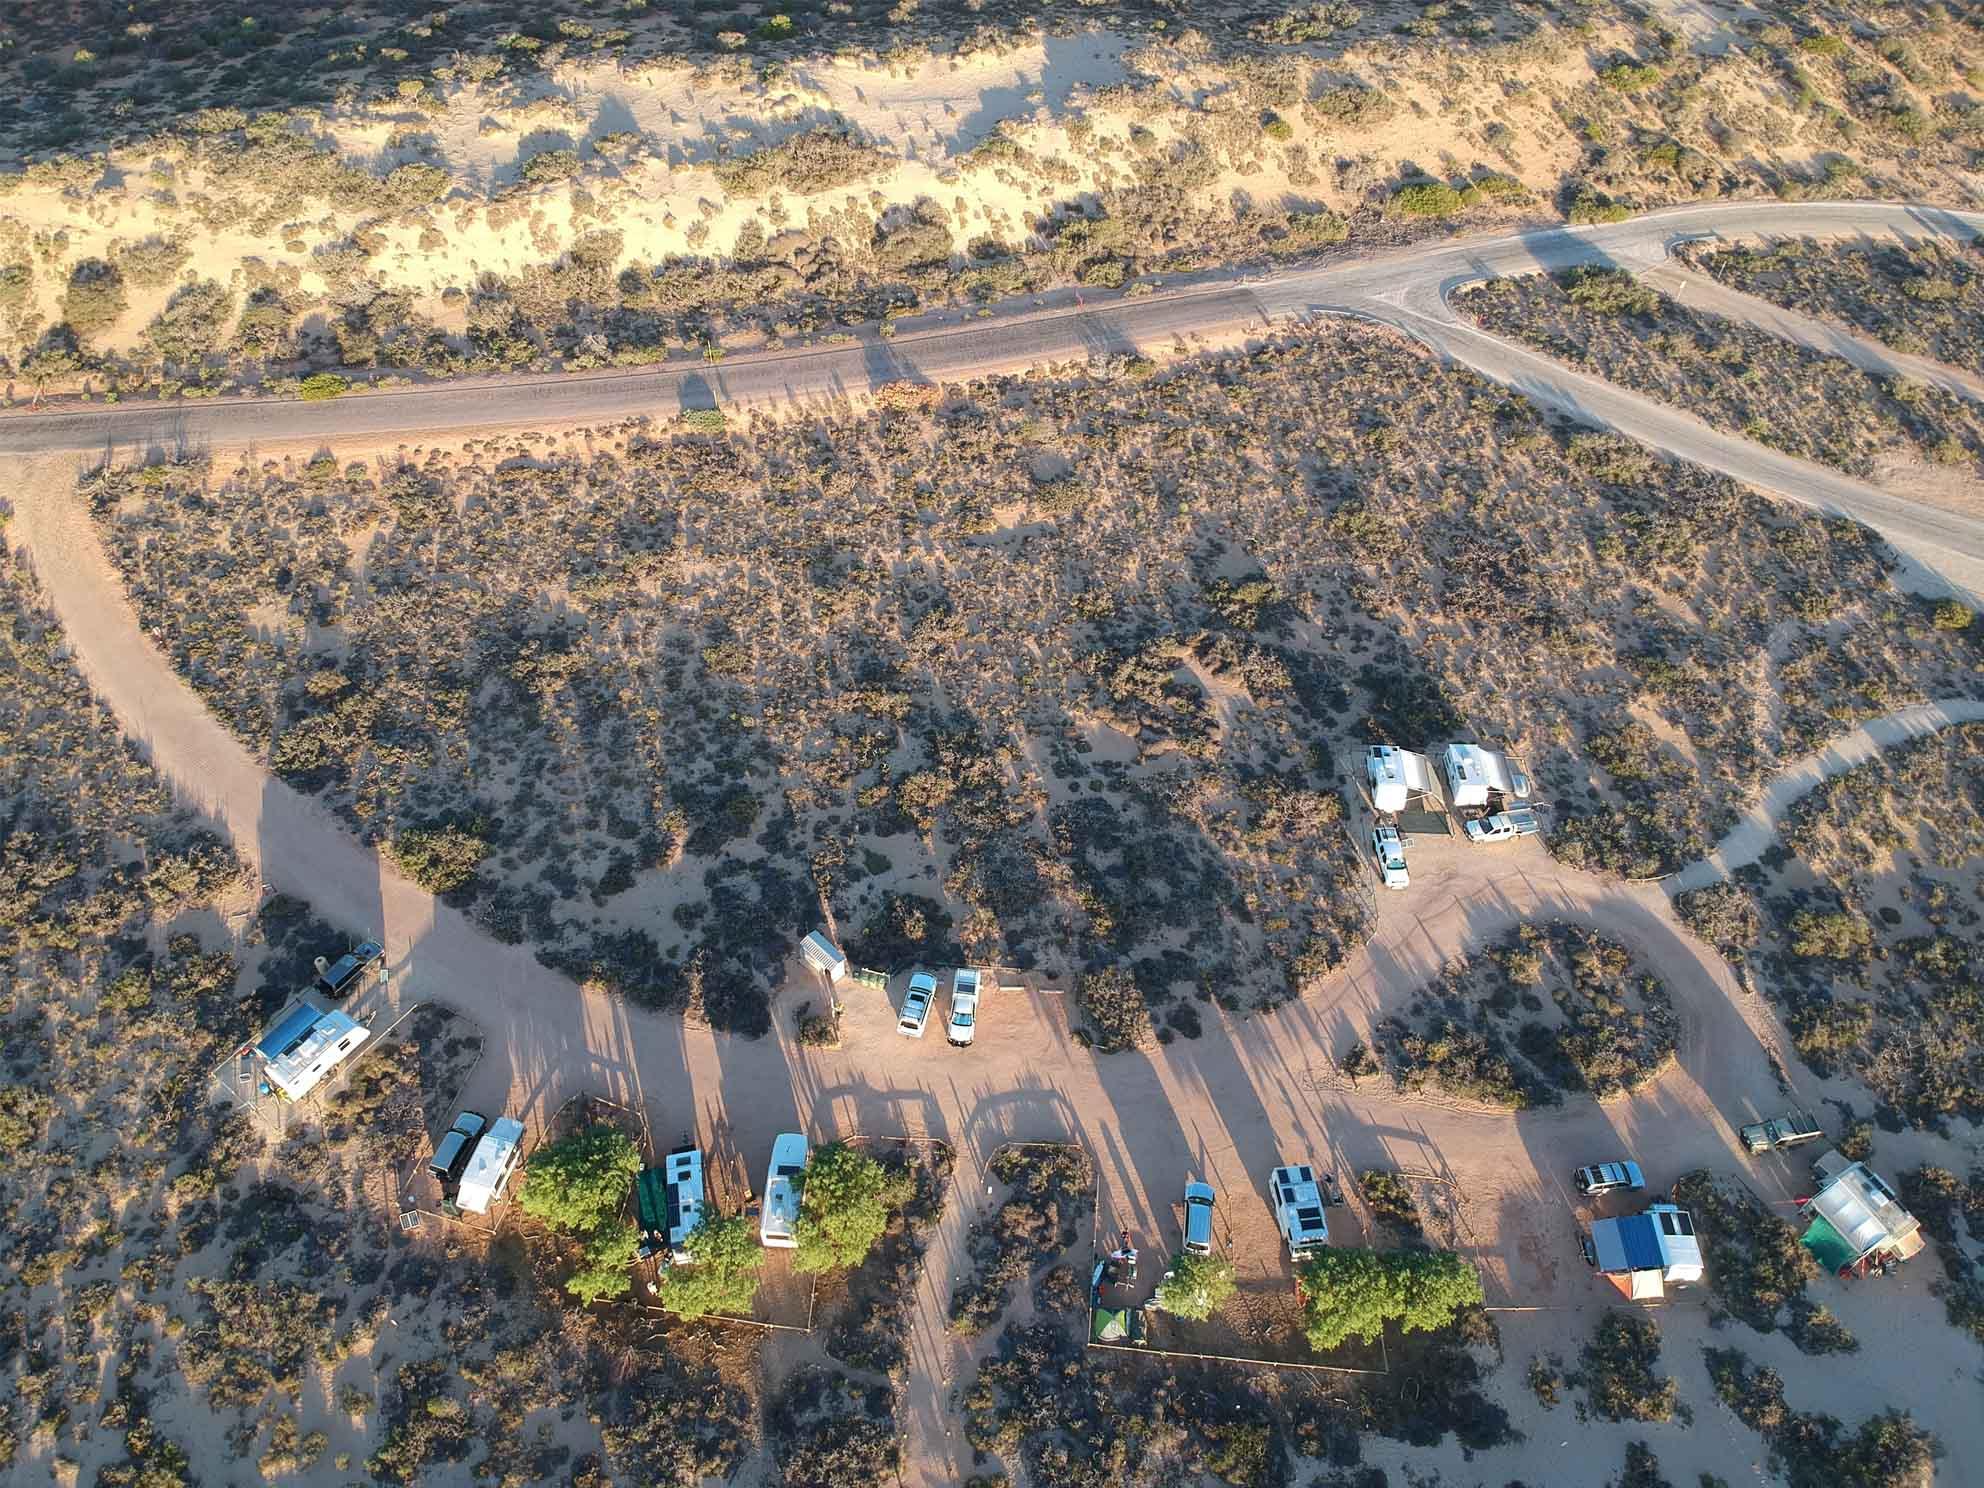 Cape Range Campingplatz (Yardie Creek)